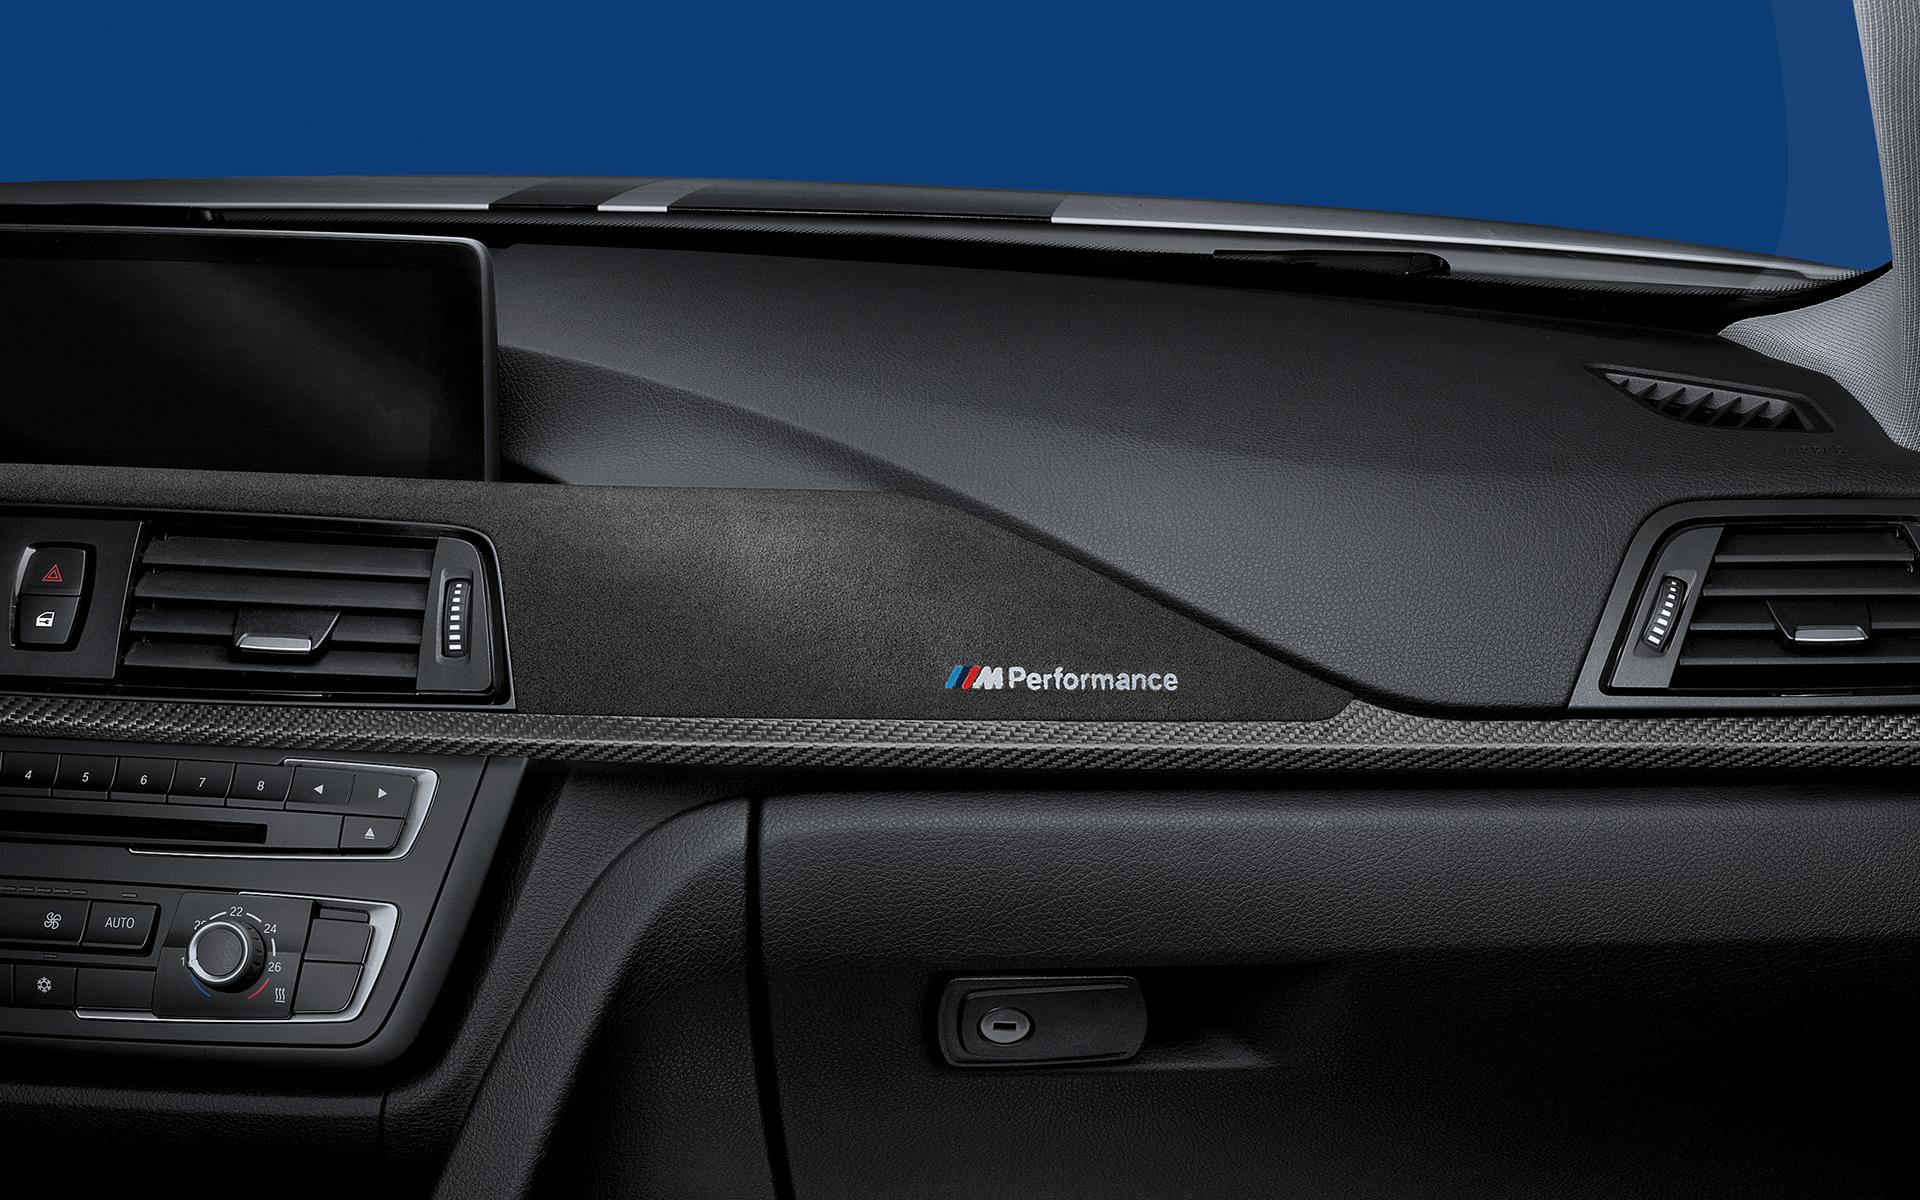 Bmw Performance Onderdelen >> BMW Accessoires en onderdelen - M Performance overzicht - BMW.nl